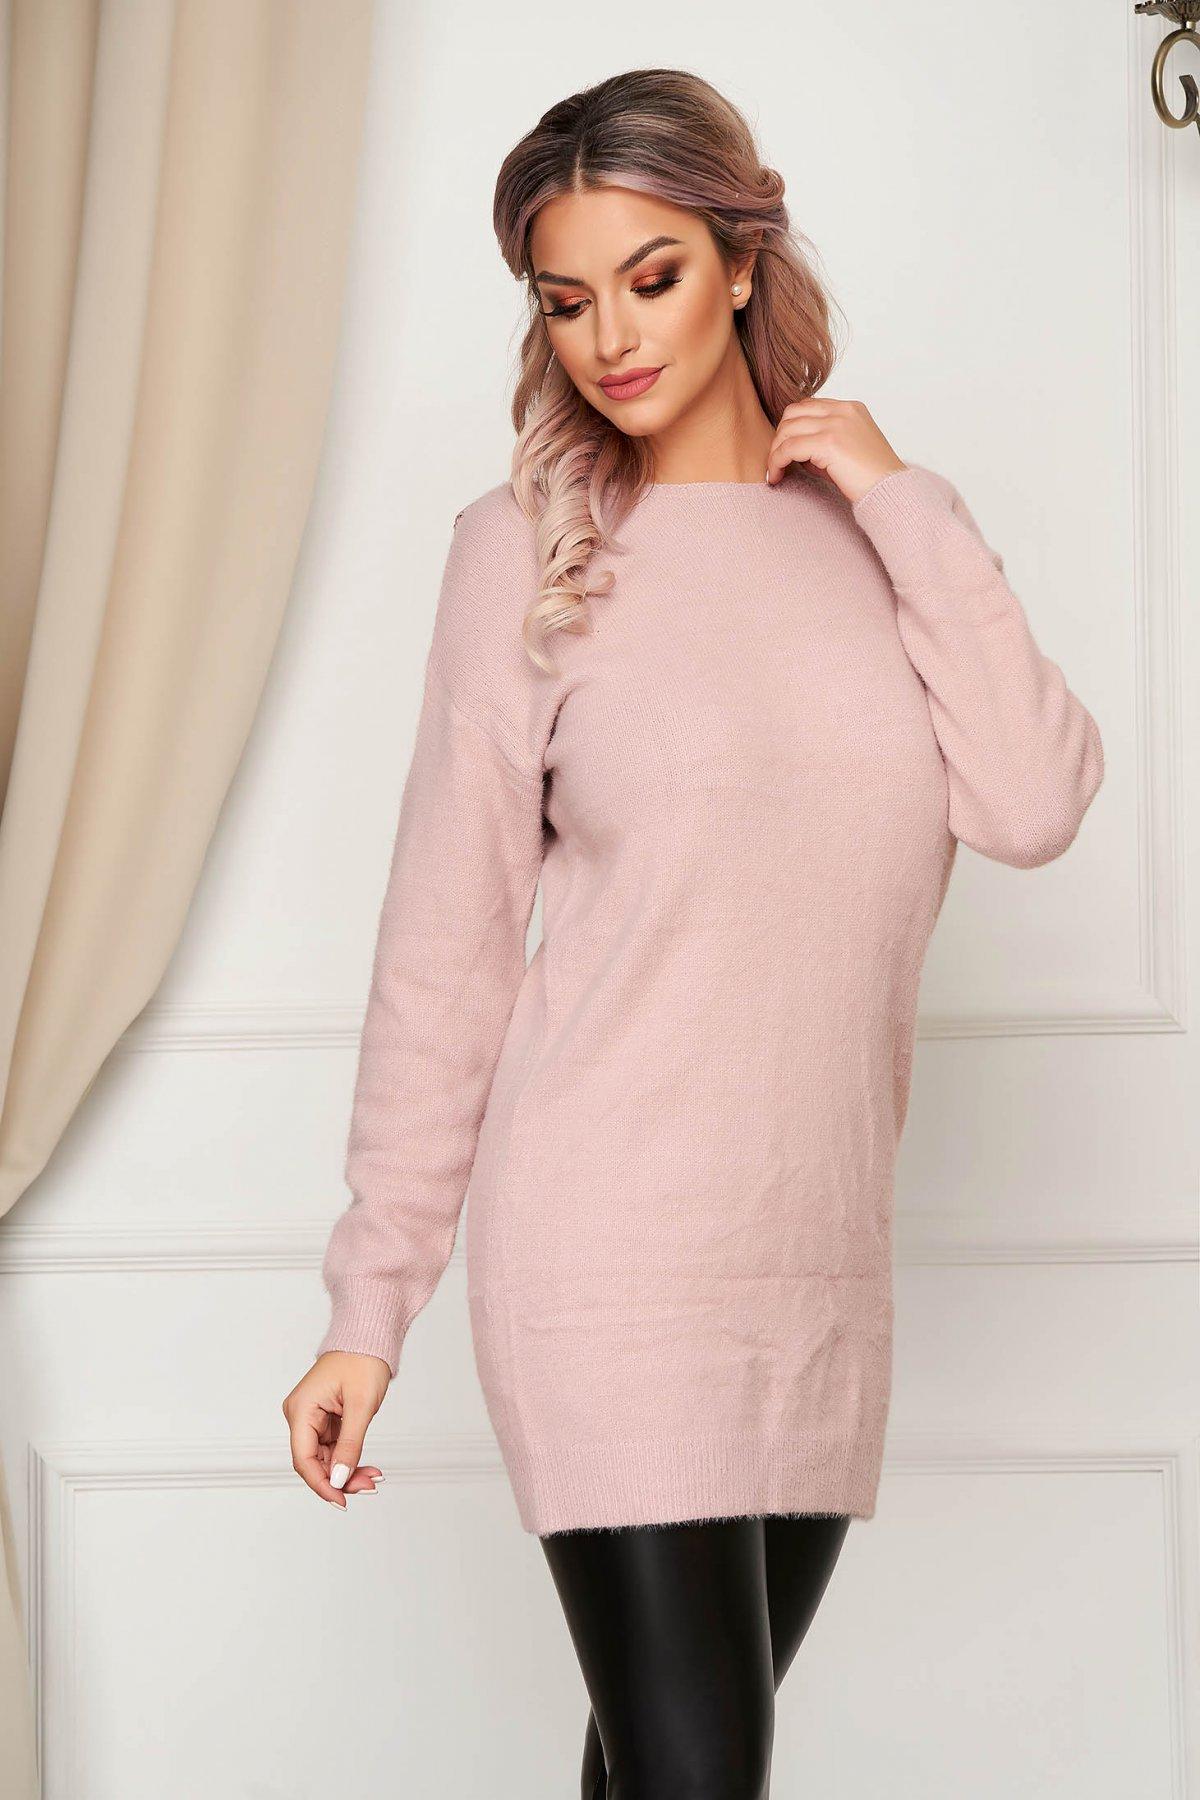 Pulover SunShine roz cu croi larg cu decolteu in v cu aplicatii de dantela din material tricotat imagine